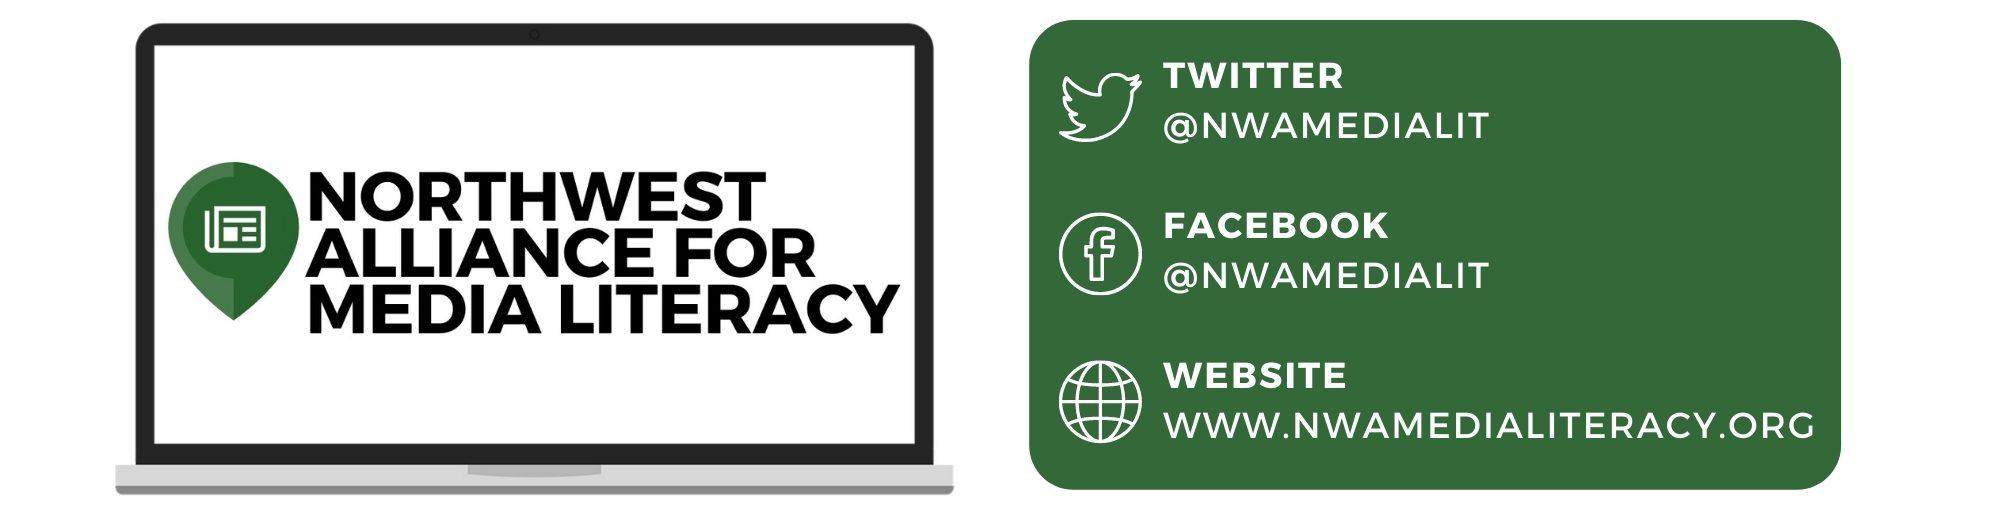 Northwest Alliance for Media Literacy